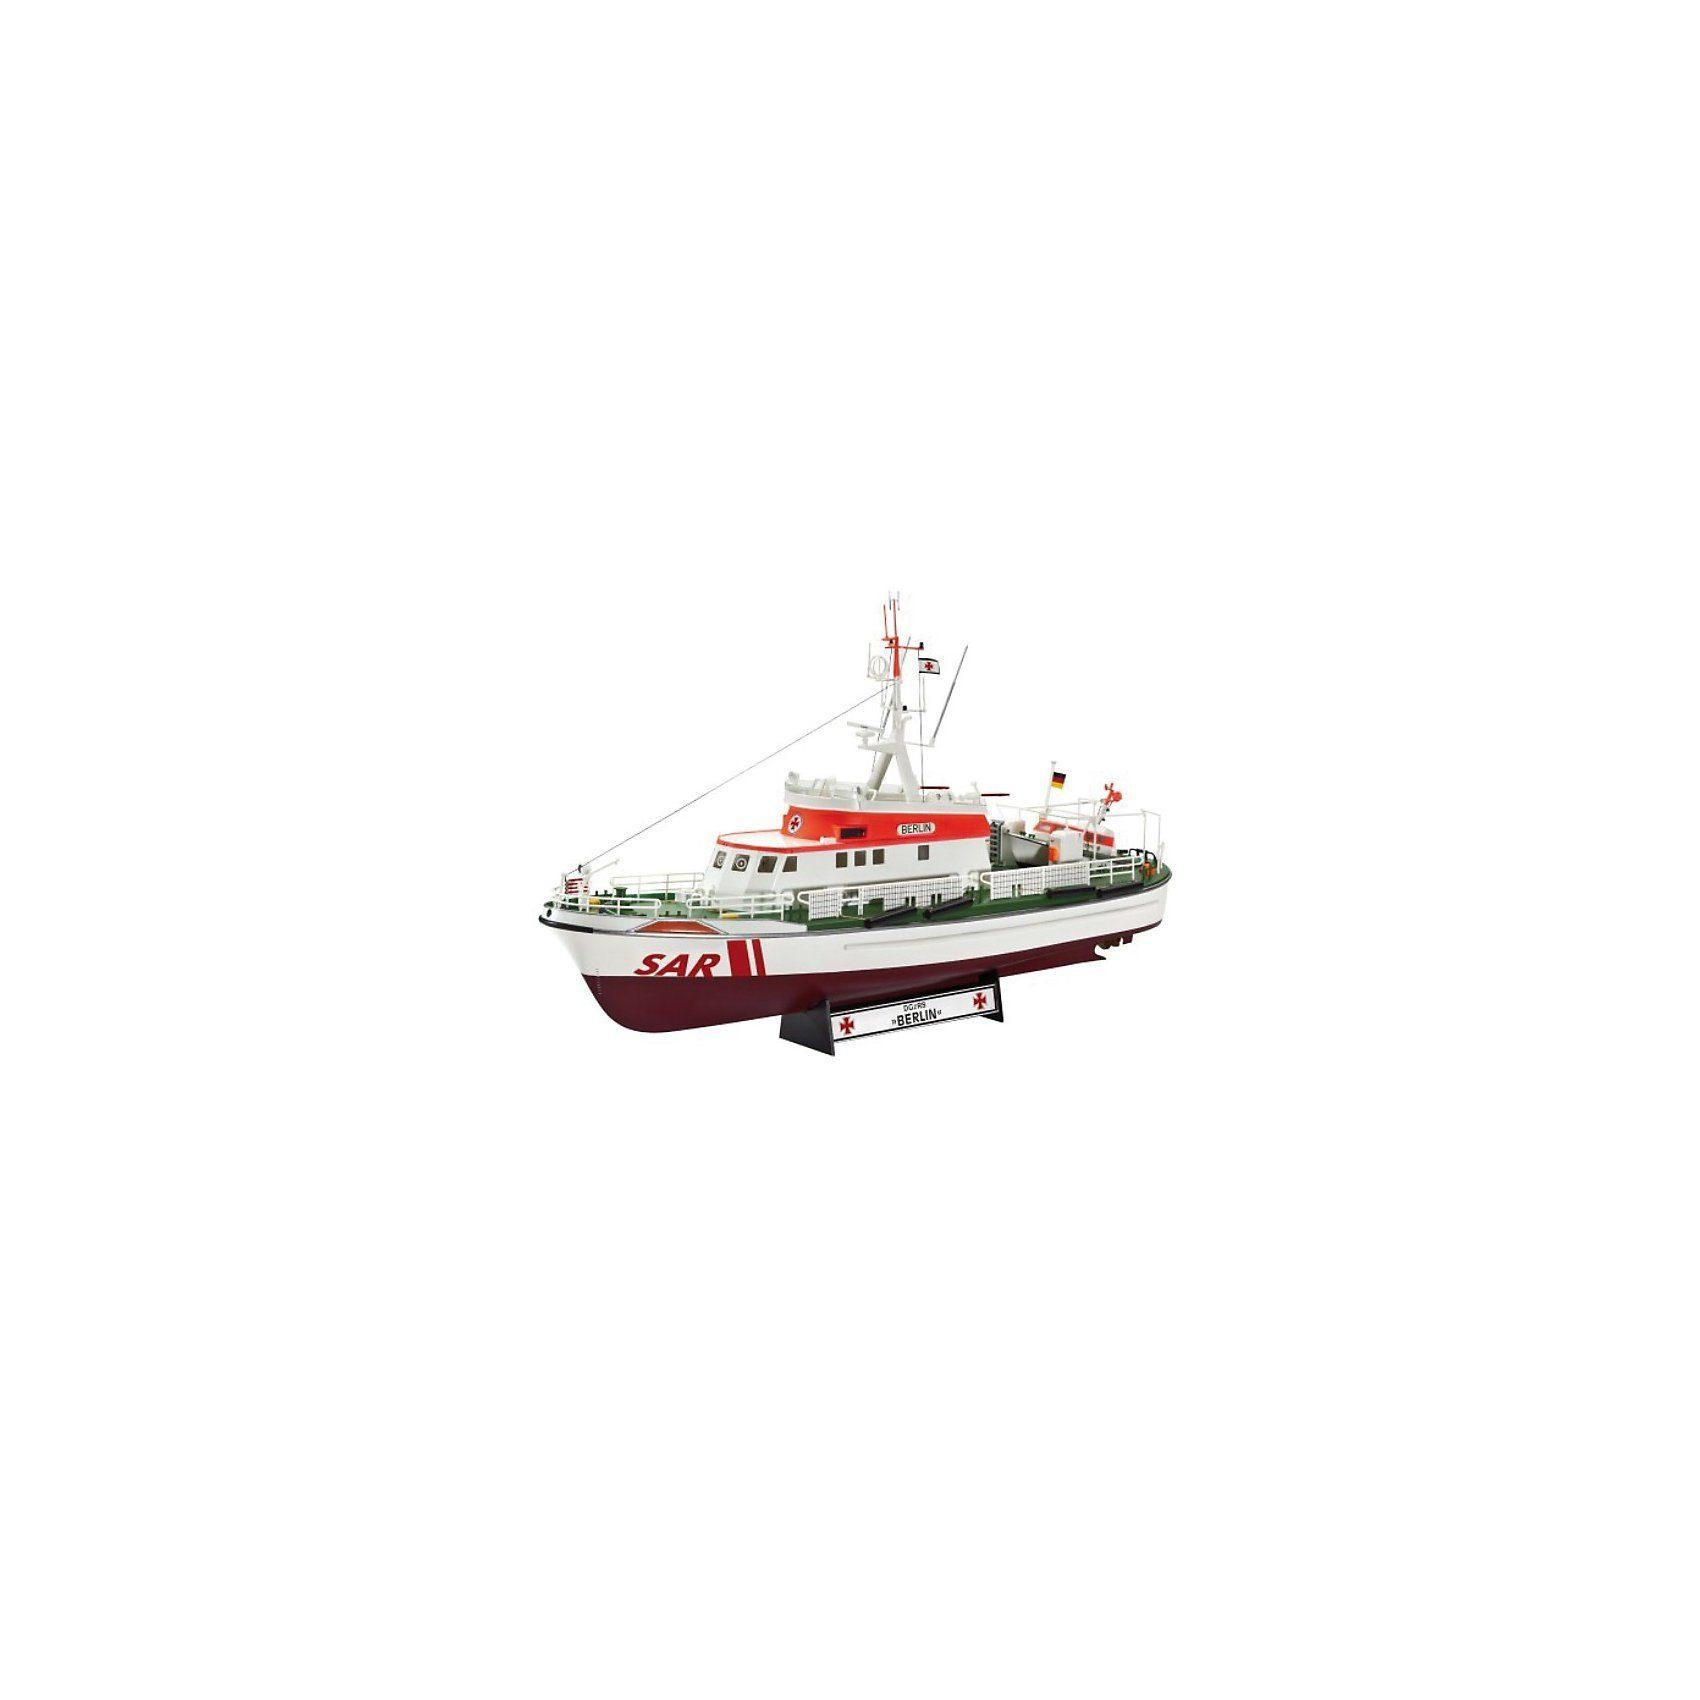 Revell Modellbausatz Seenotkreuzer BERLIN im Maßstab 1:72